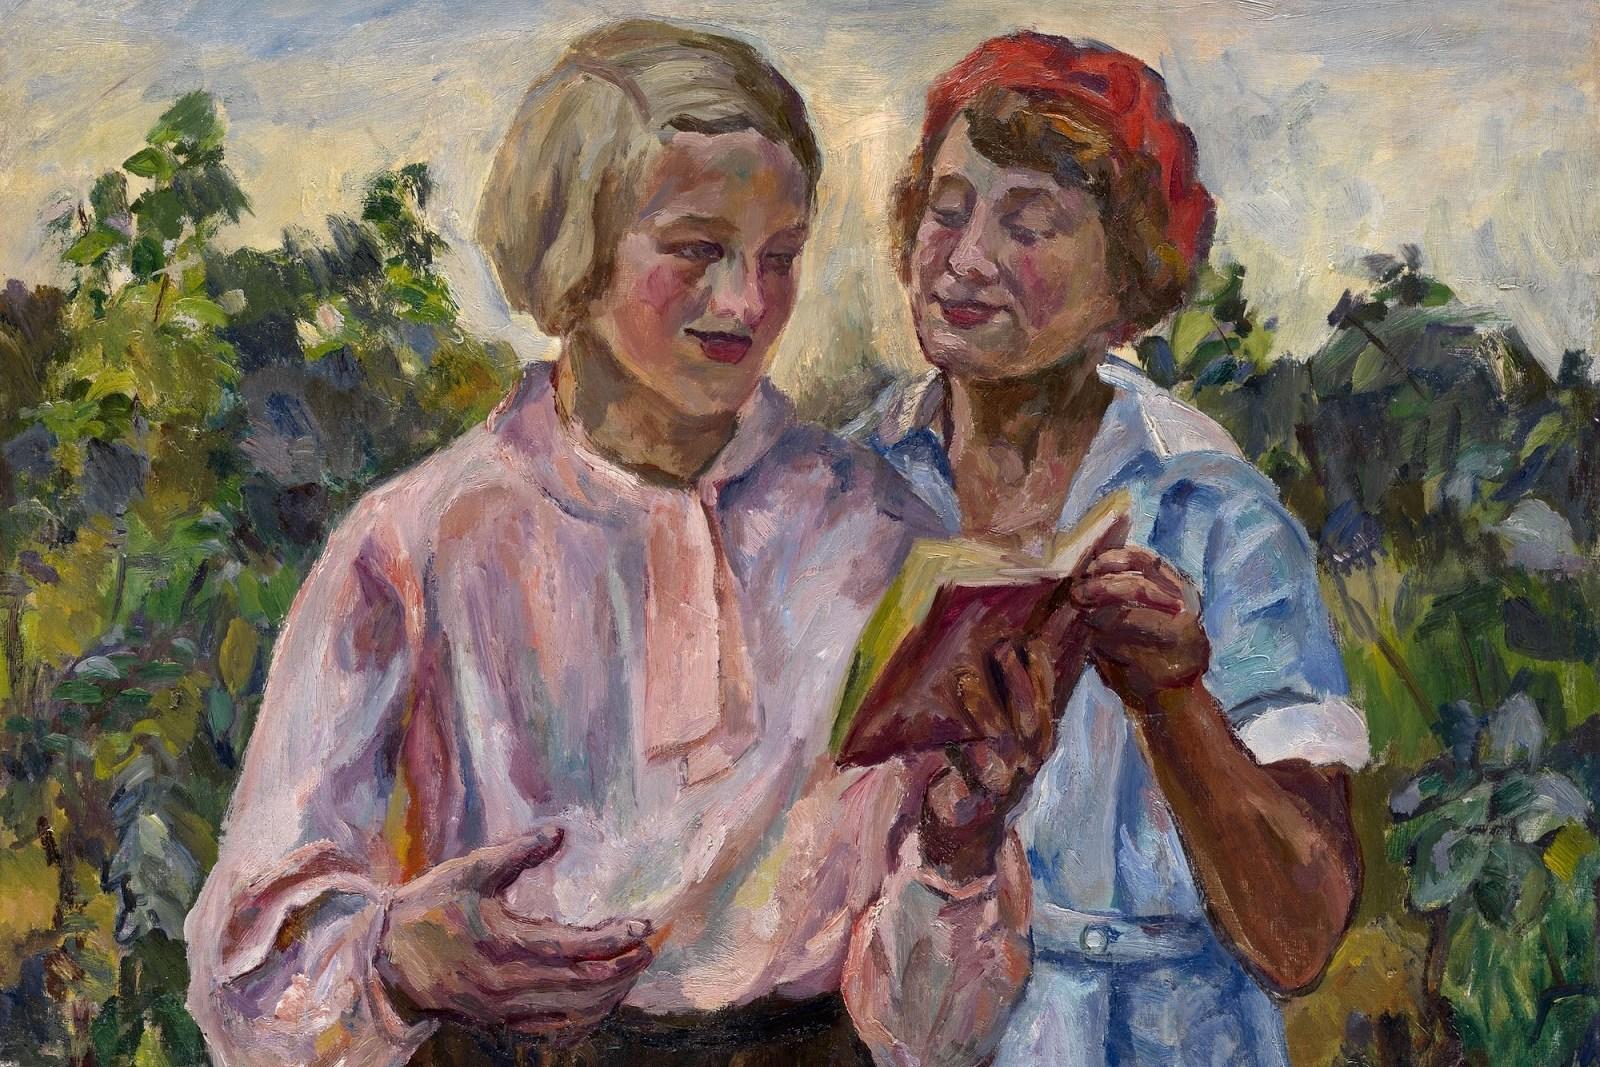 Аристарх Лентулов. Чтение стихов